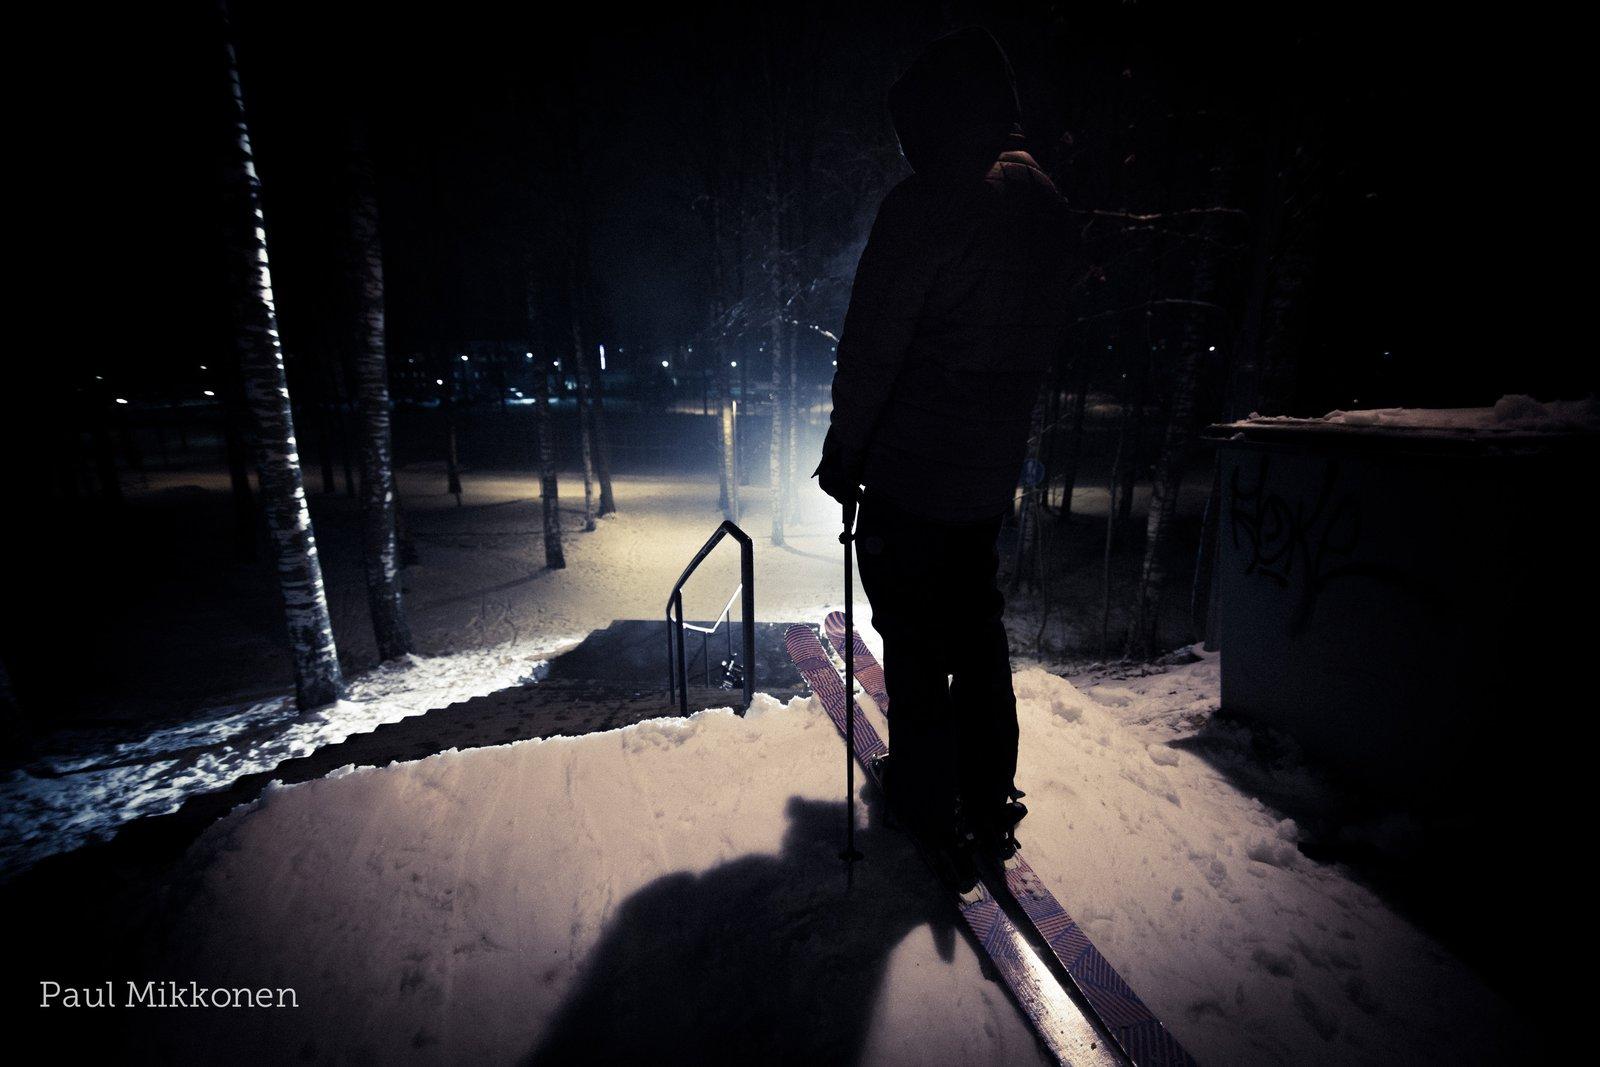 #Nordichooligans - Paul Mikkonen